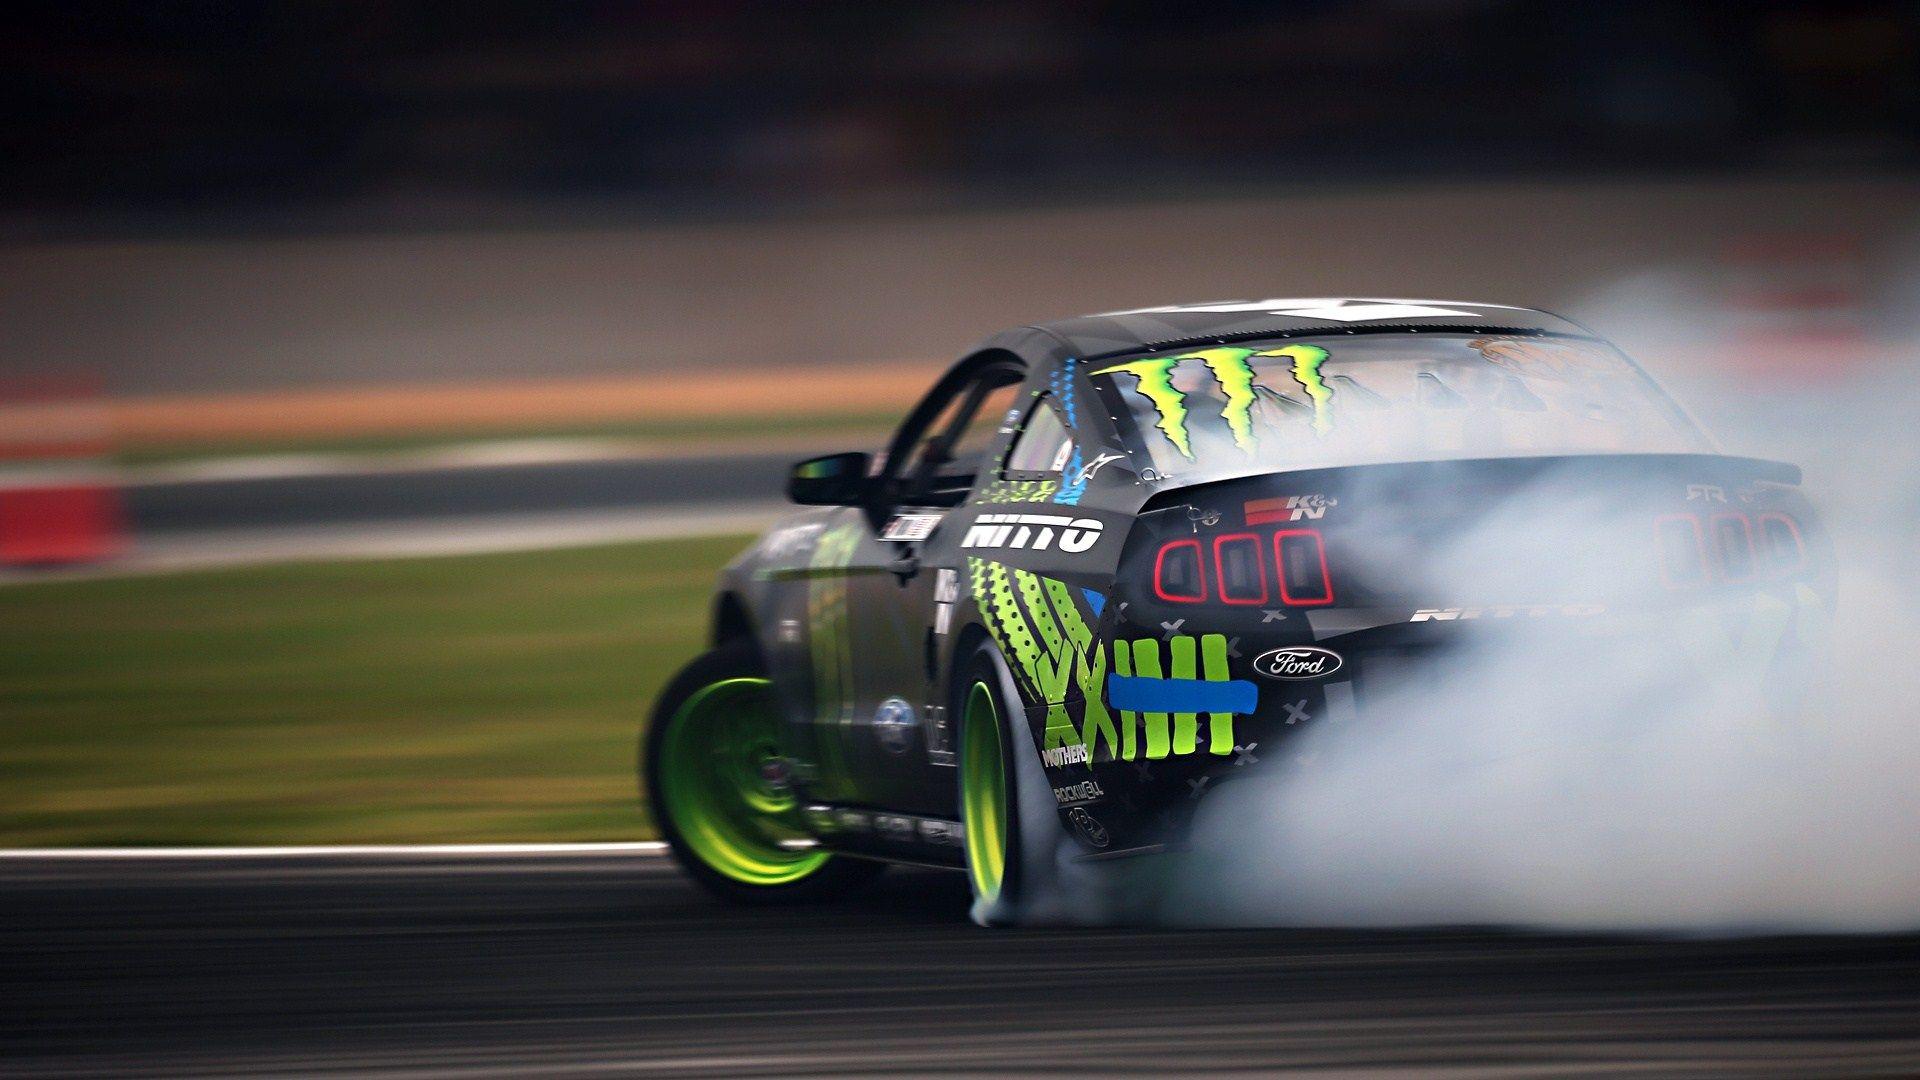 Ford Mustang Drift Track Smoke Wide Hd Wallpaper Wpwide Mustangs